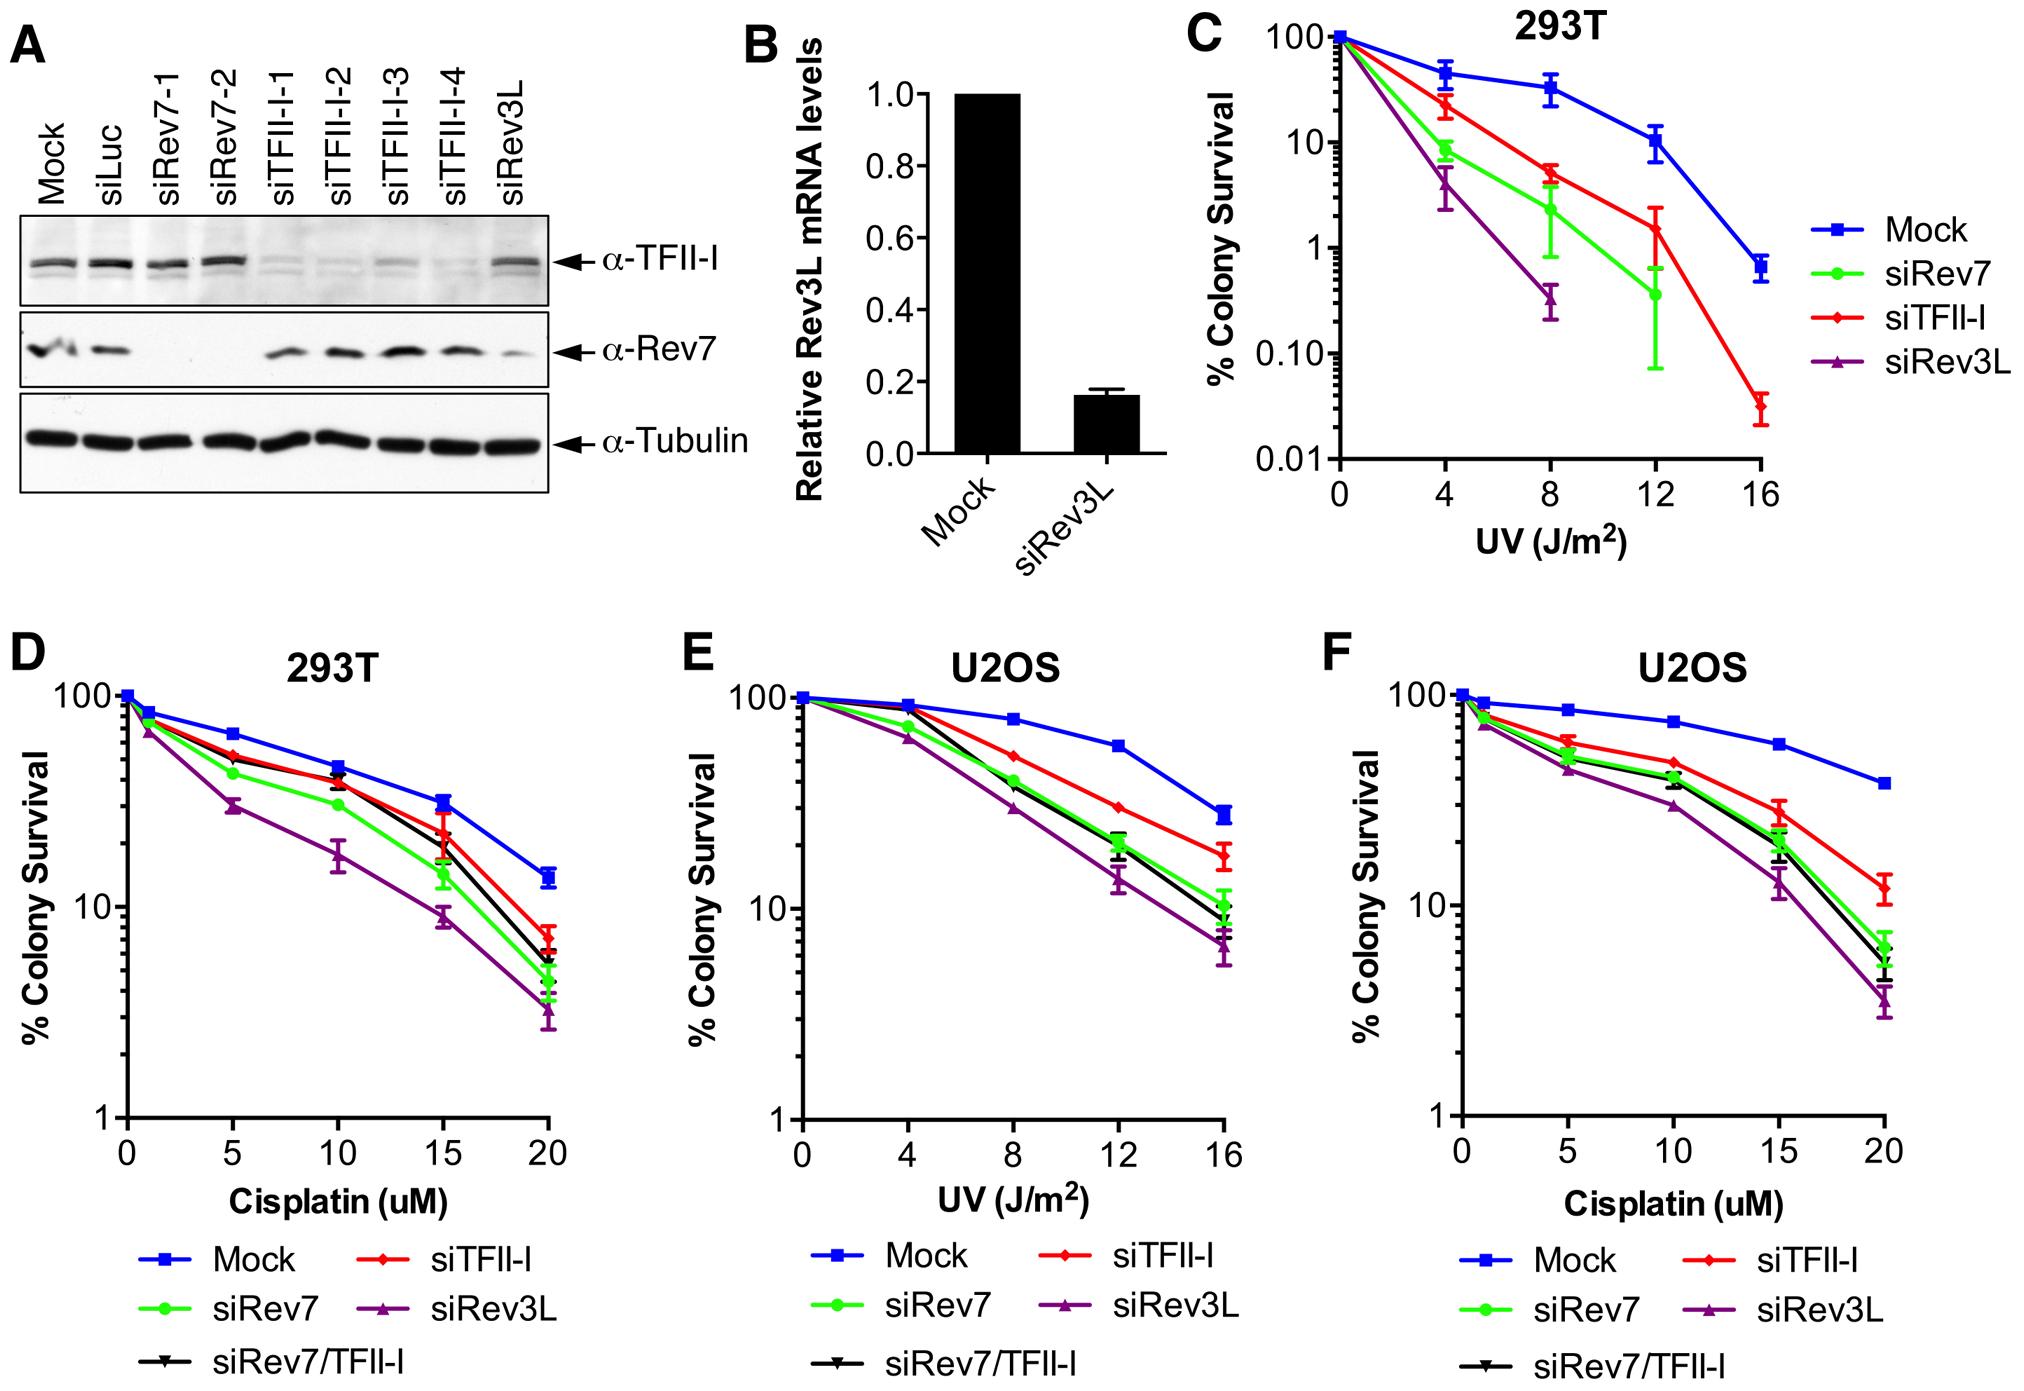 TFII-I depletion in human cells causes UV and cisplatin sensitivity.